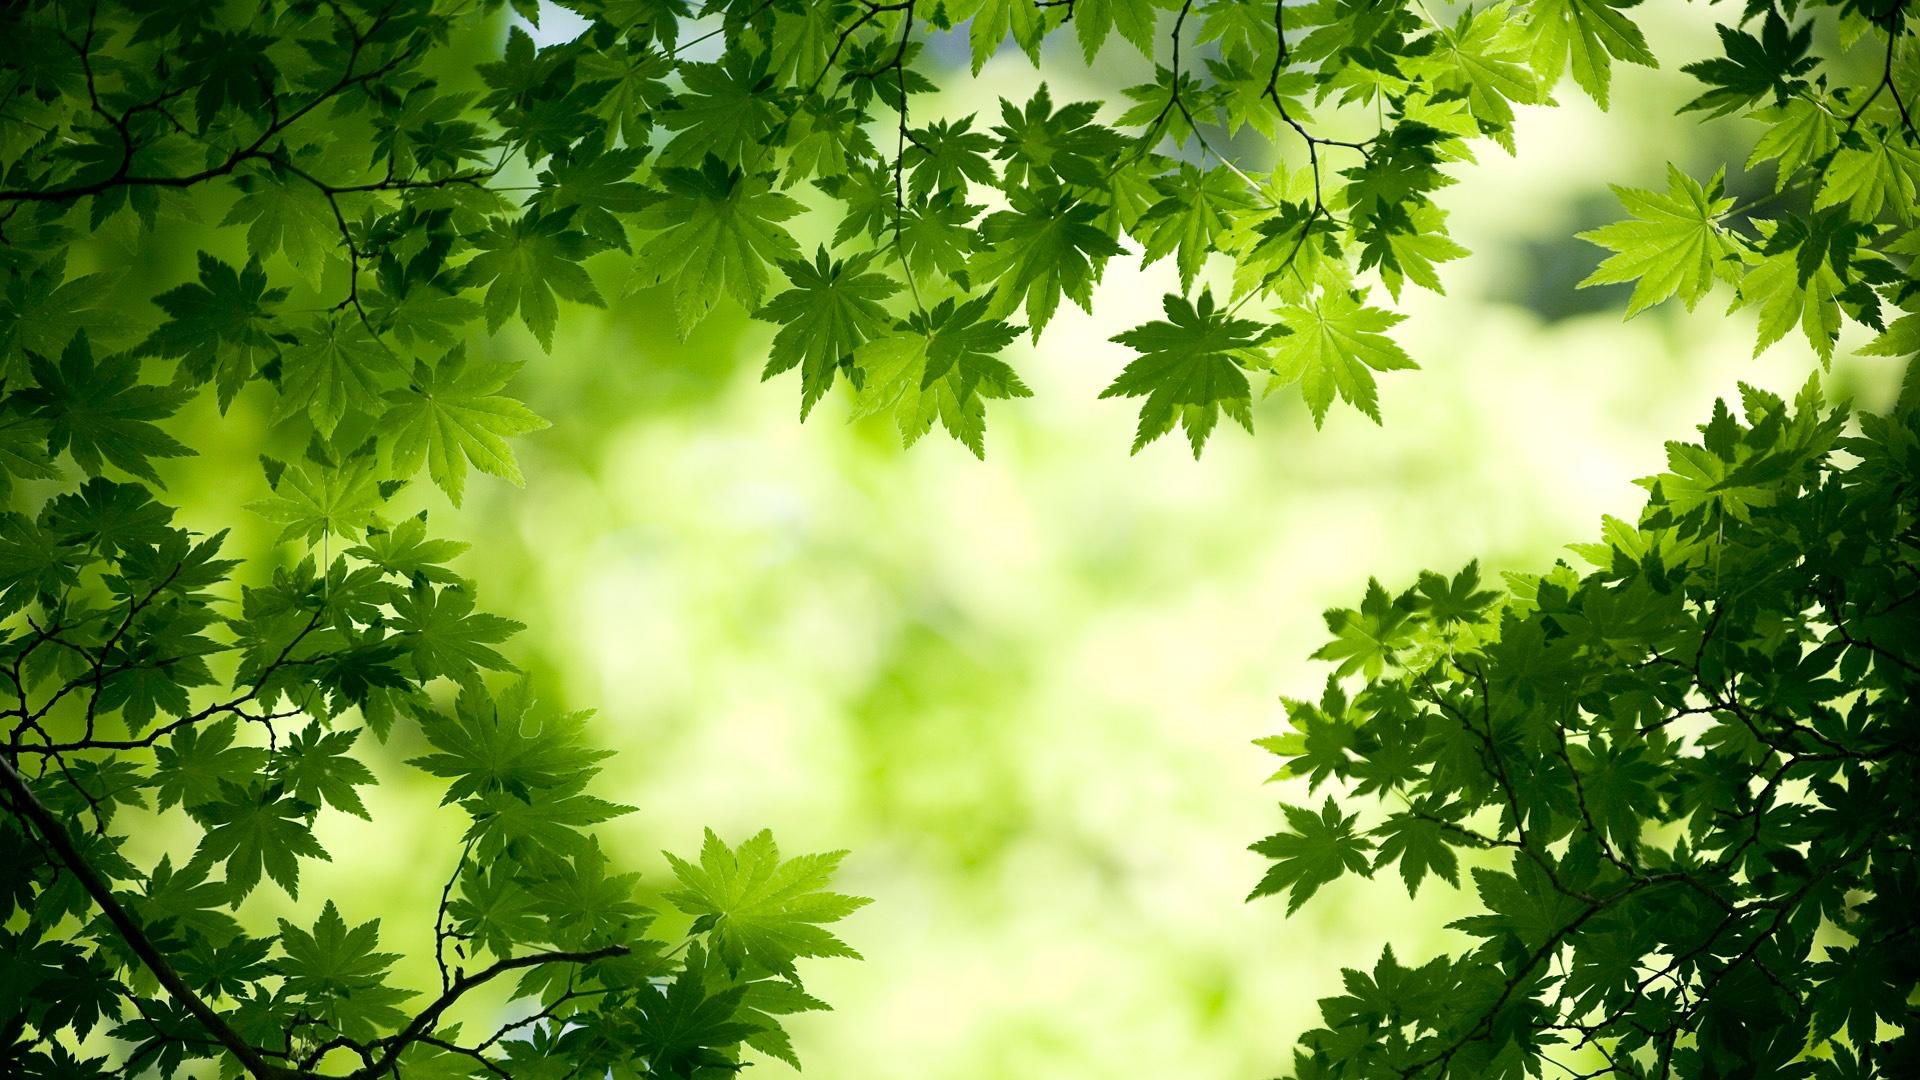 http://3.bp.blogspot.com/-BWNeXLivfBg/UGfufAHqyDI/AAAAAAAAK-k/wHBF7aHUbNU/s0/green-maple-leaves-1920x1080.jpg